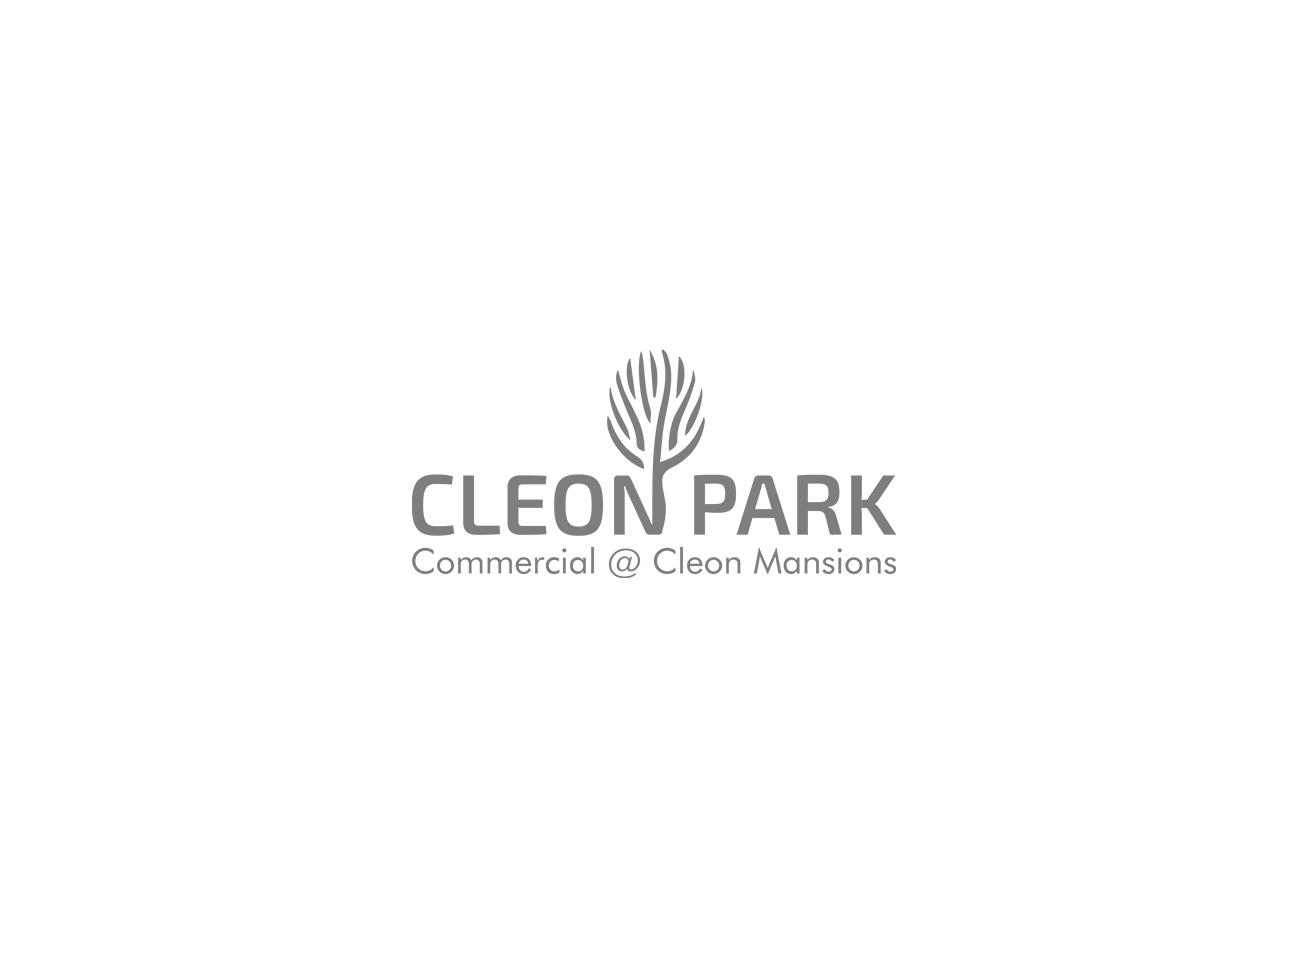 Cleon Park